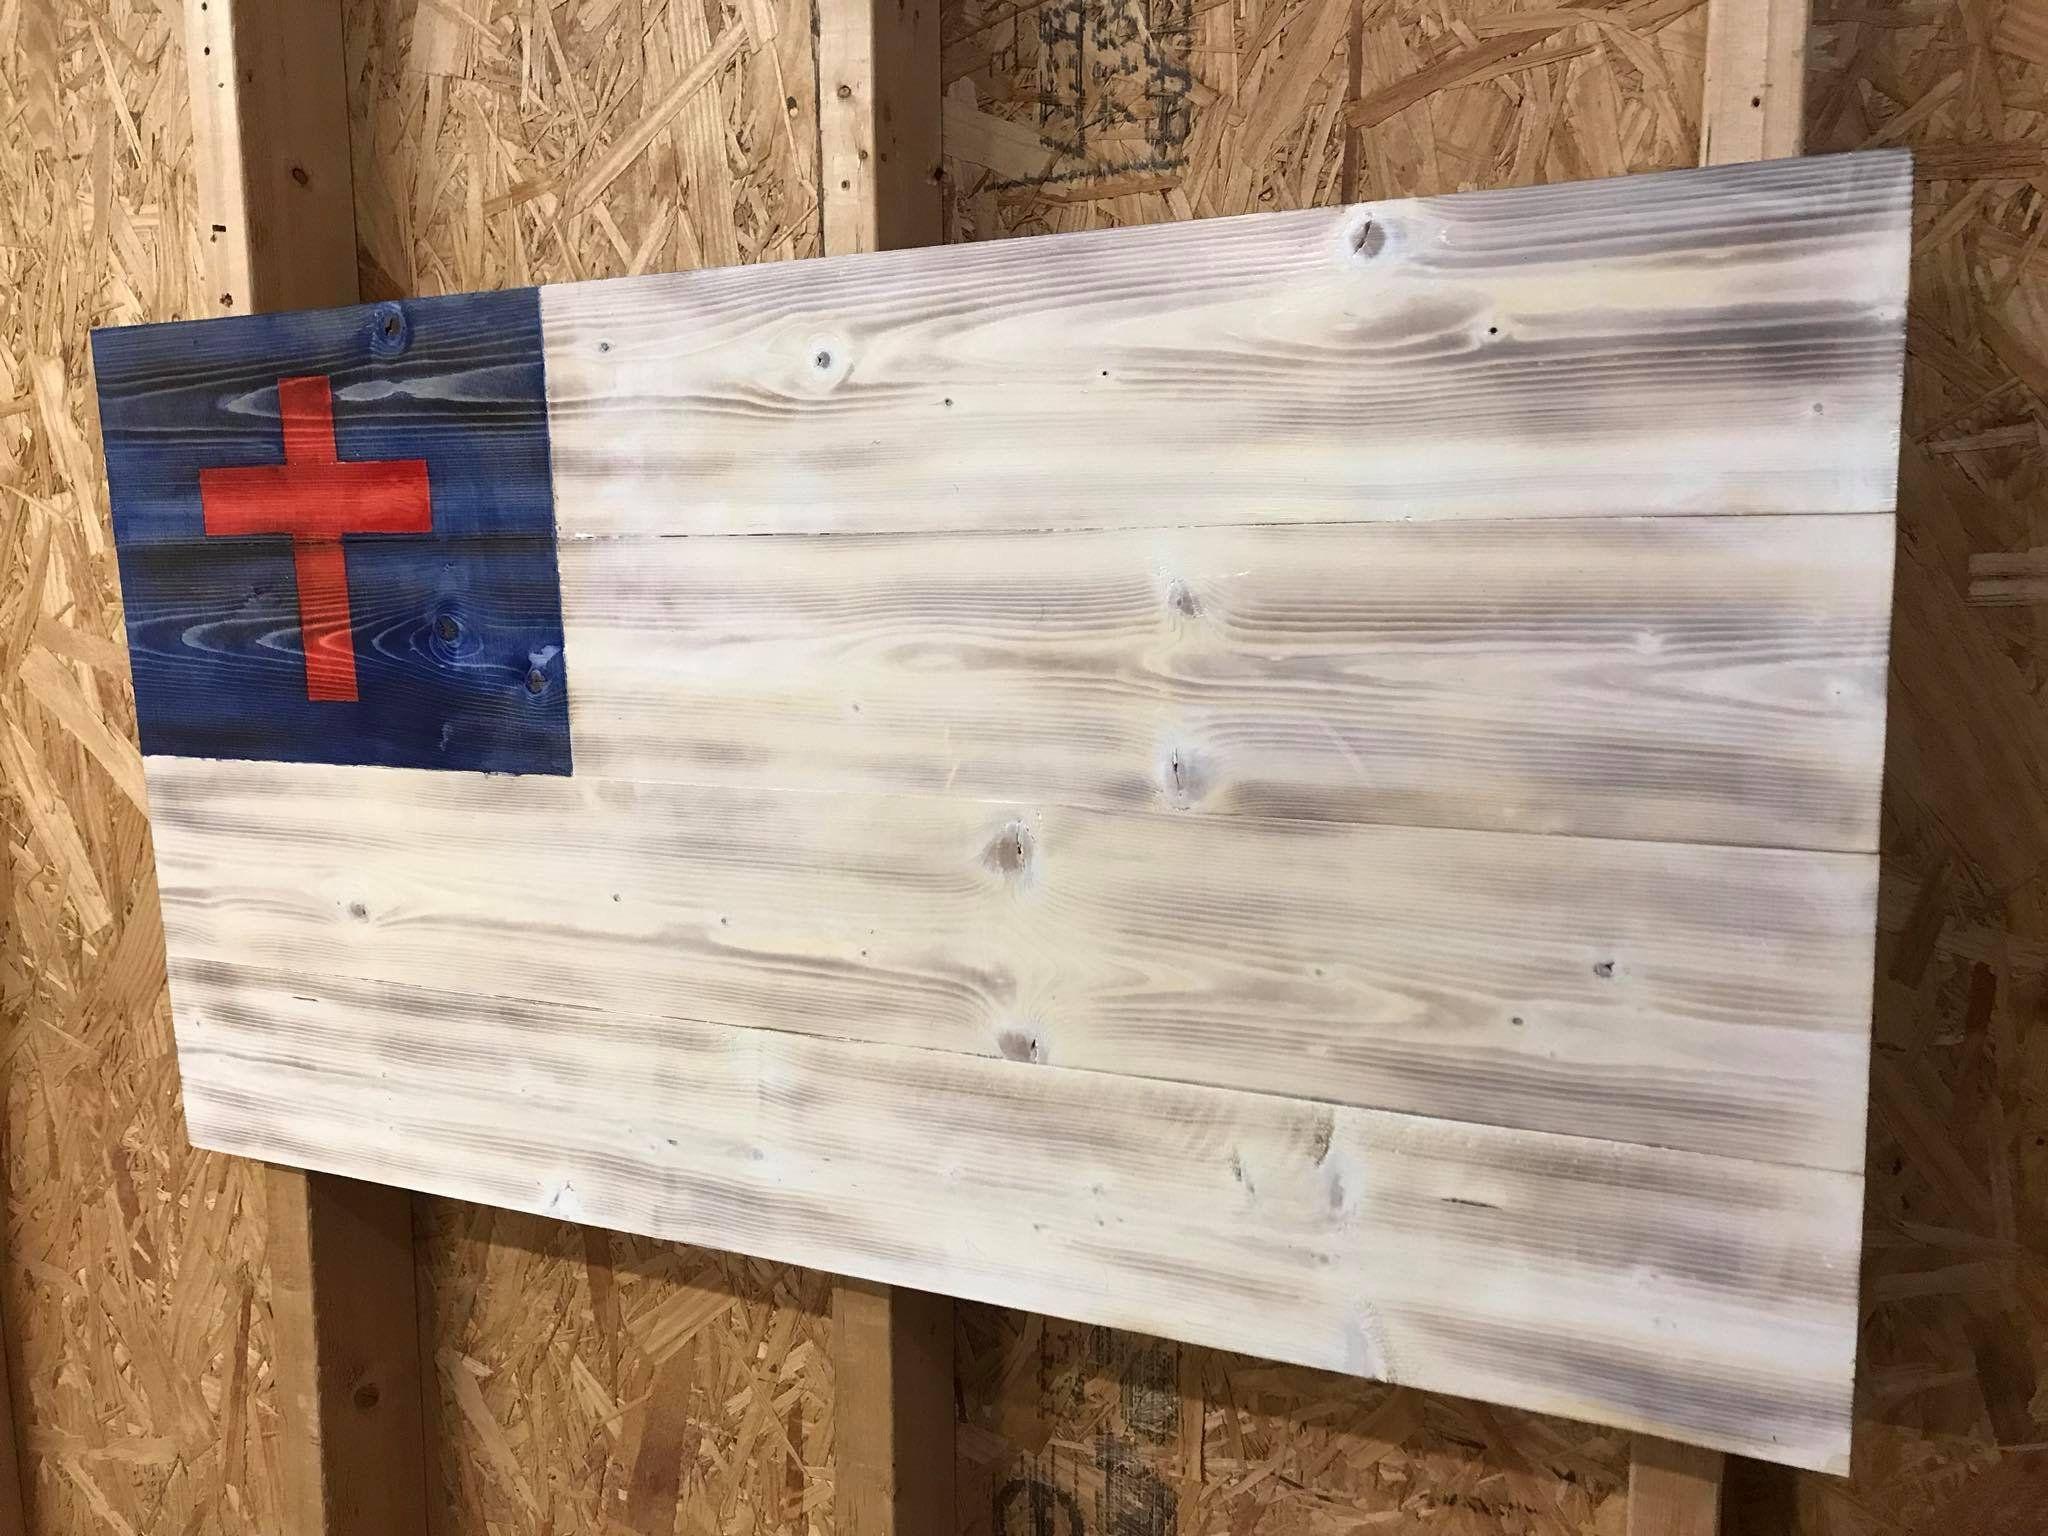 Christian Flag Wood Christian Flag Rustic Christian Flag Etsy In 2020 Rustic Christian Christian Flag Rustic American Flag